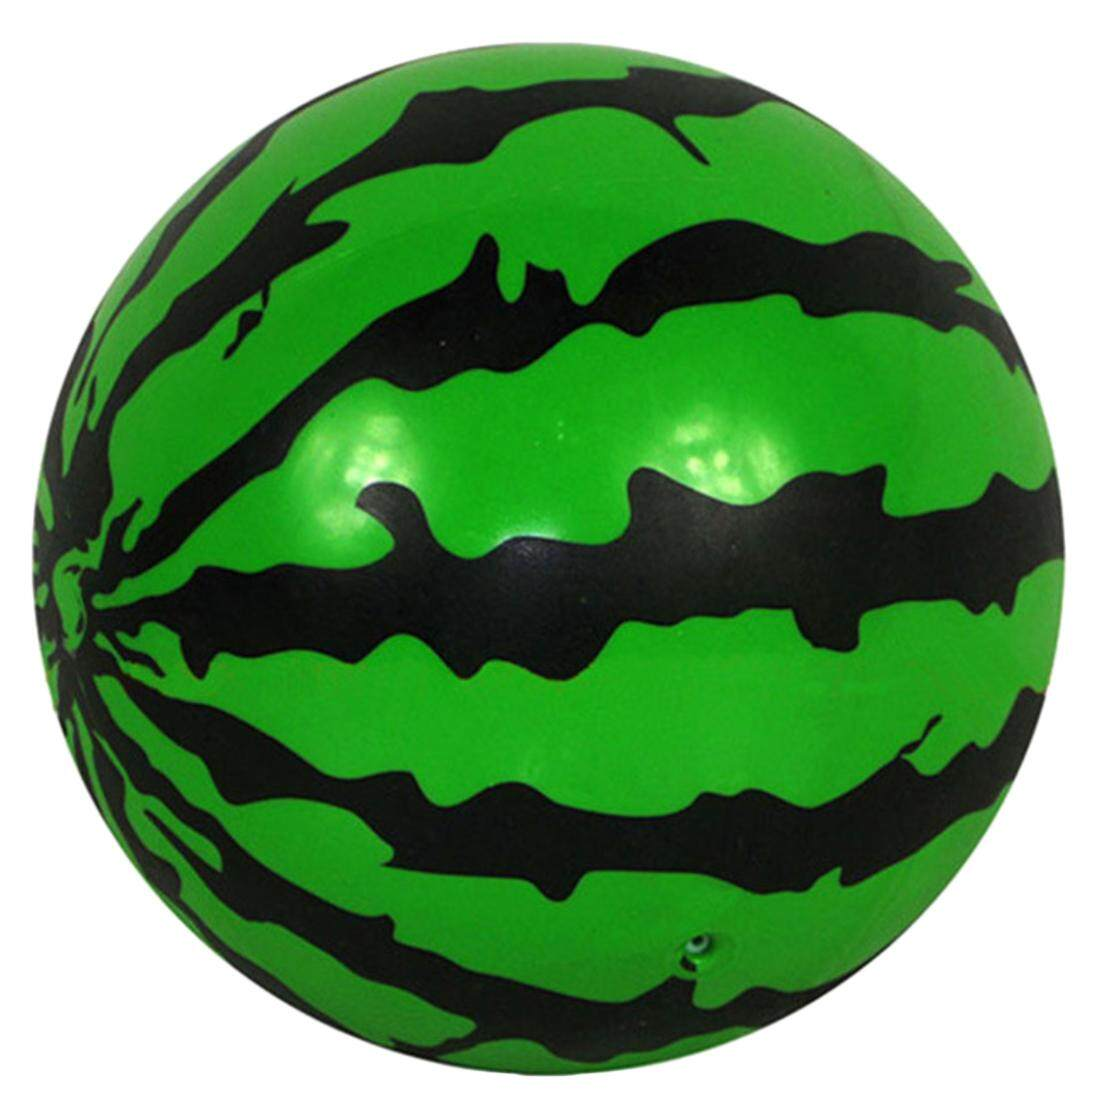 Hình ảnh 360DSC 16cm Inflatable Watermelon Ball Bouncy Ball Kids Sport Education Toys - intl